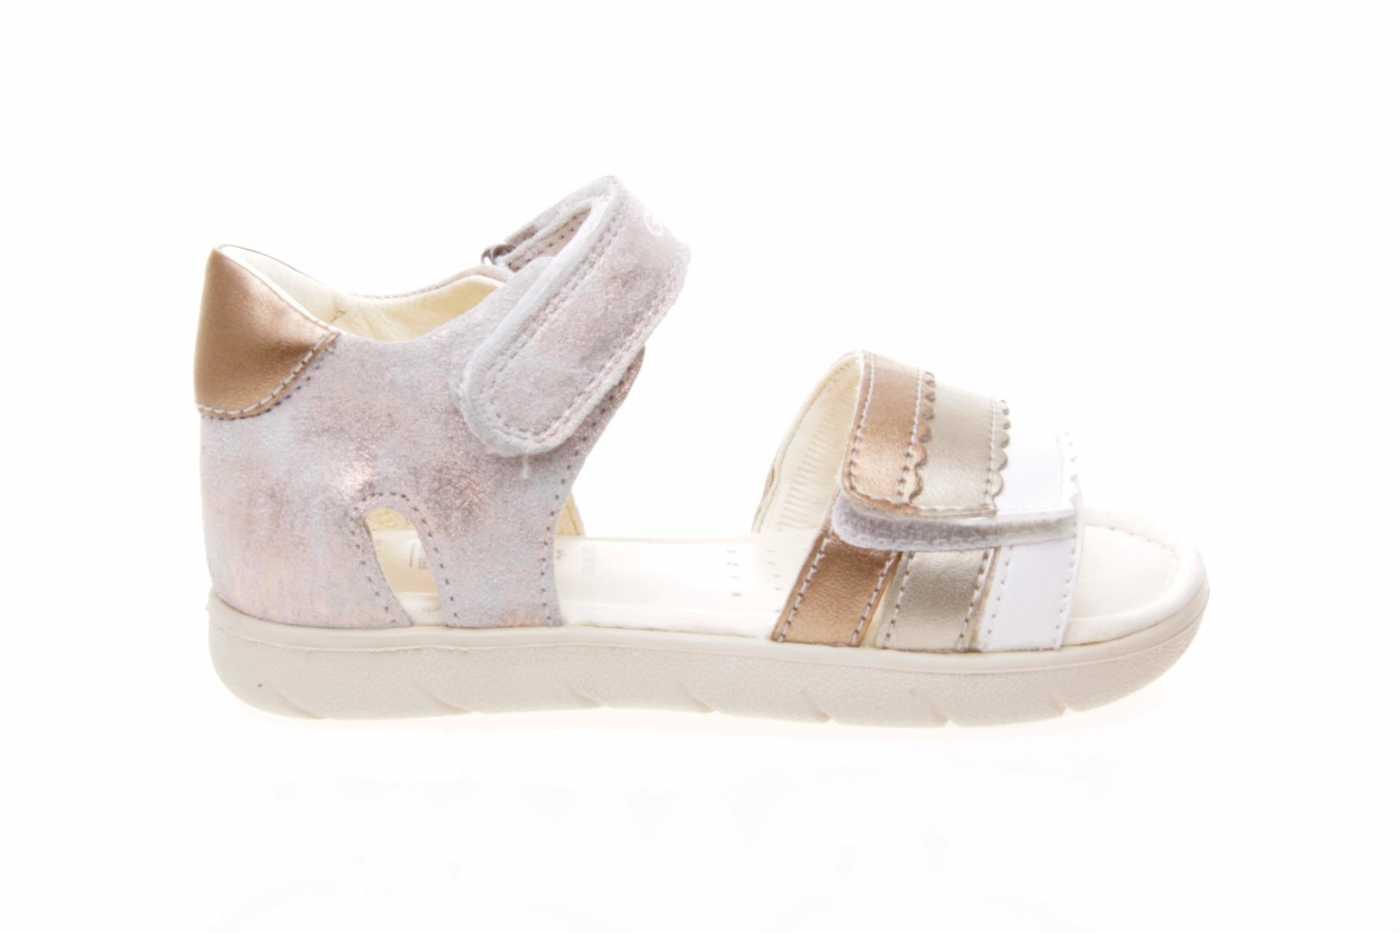 Color Estilo Piel Preandante Sandalia Tipo Zapato Niña Beige Comprar 29IWDHE